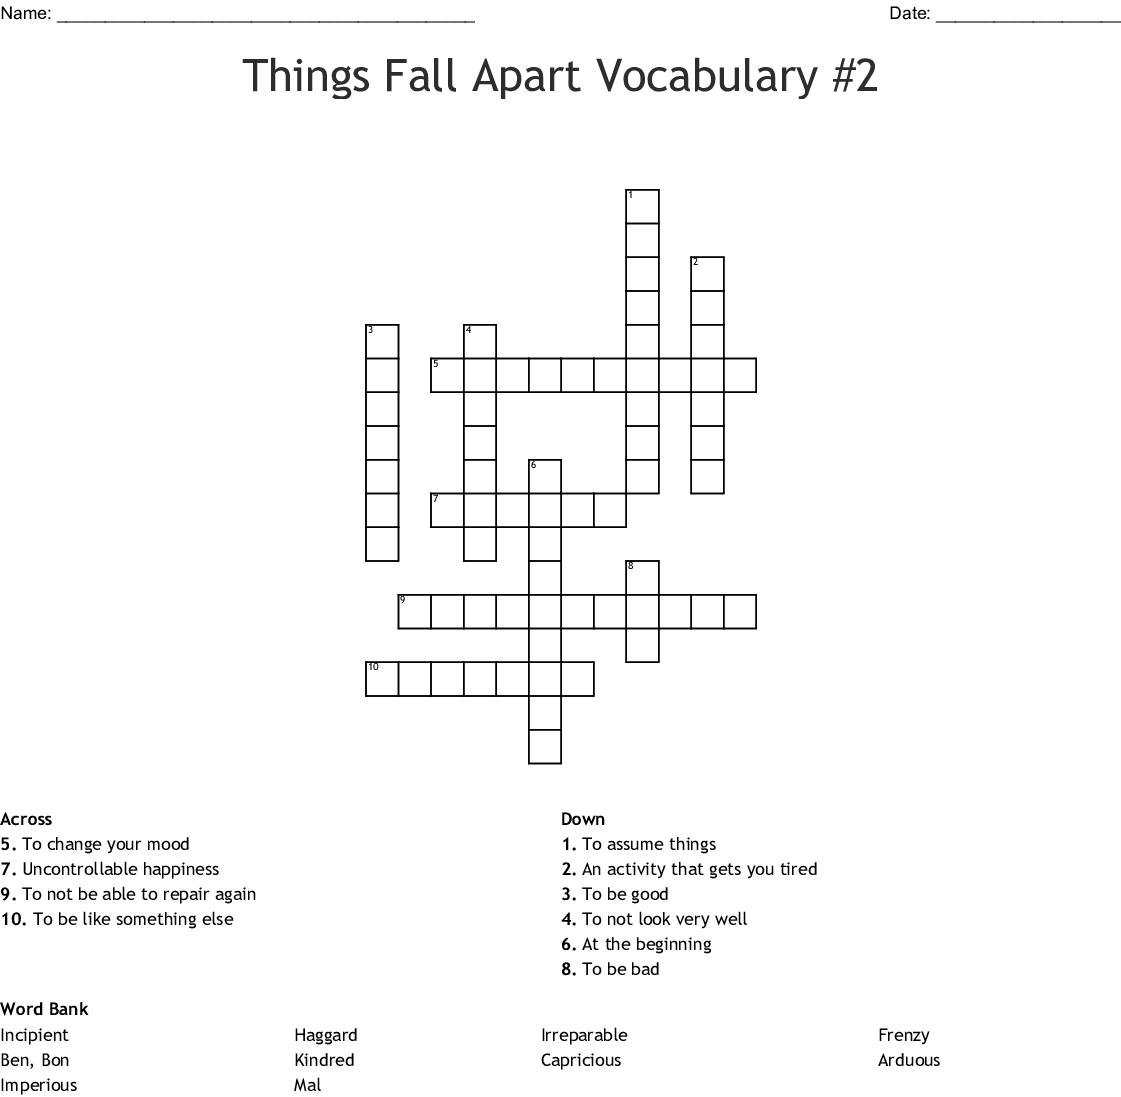 Things Fall Apart Vocabulary 2 Crossword